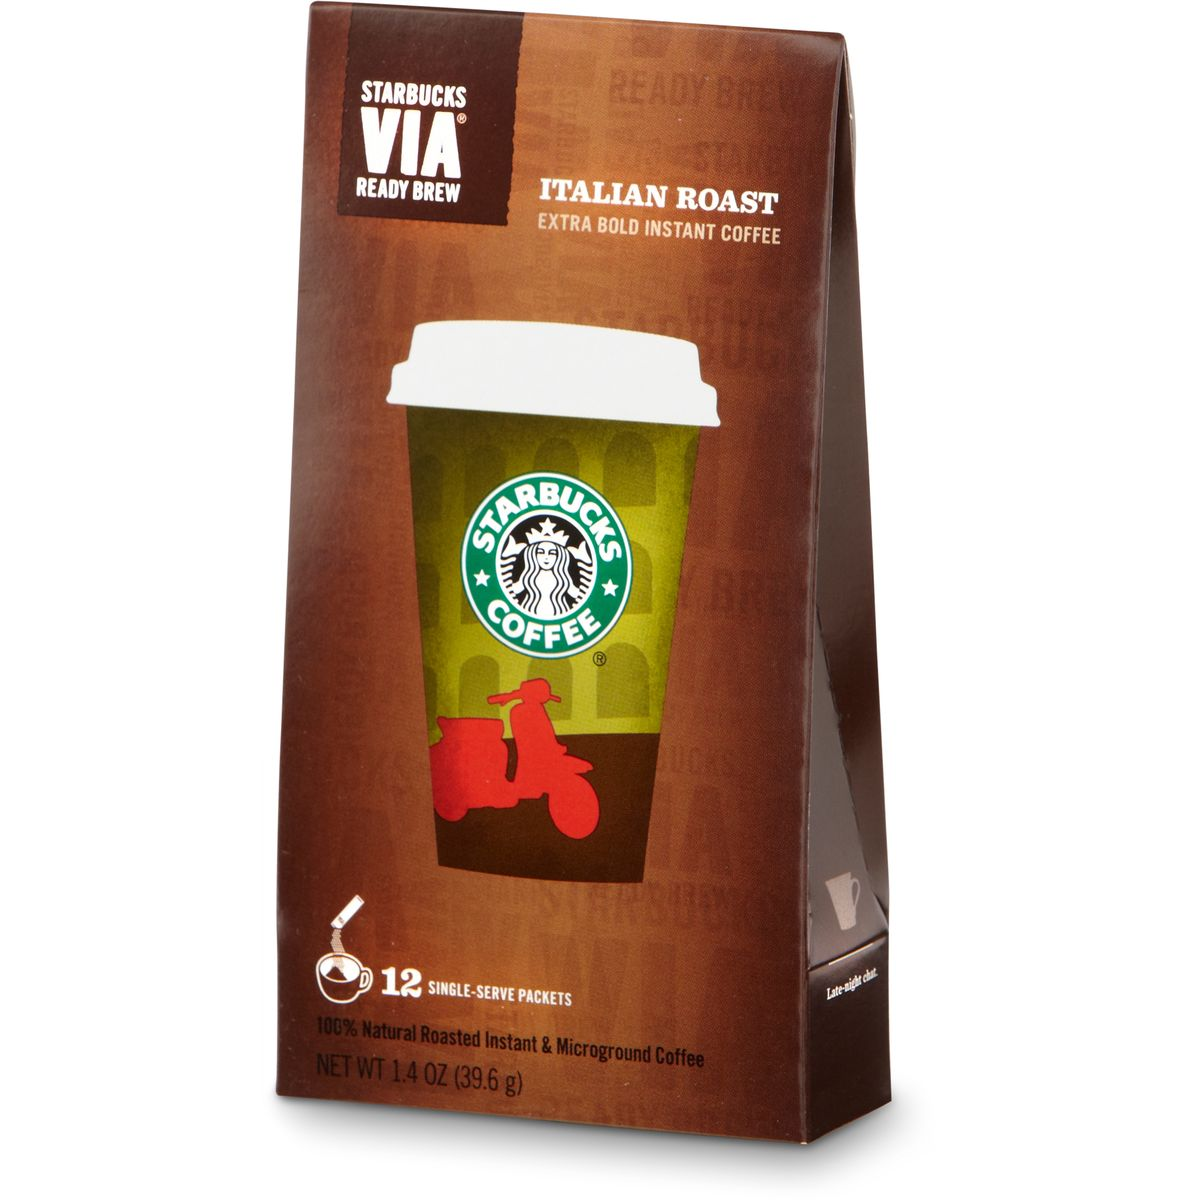 New coupons starbucks pampers buitoni plus more for Starbucks italie